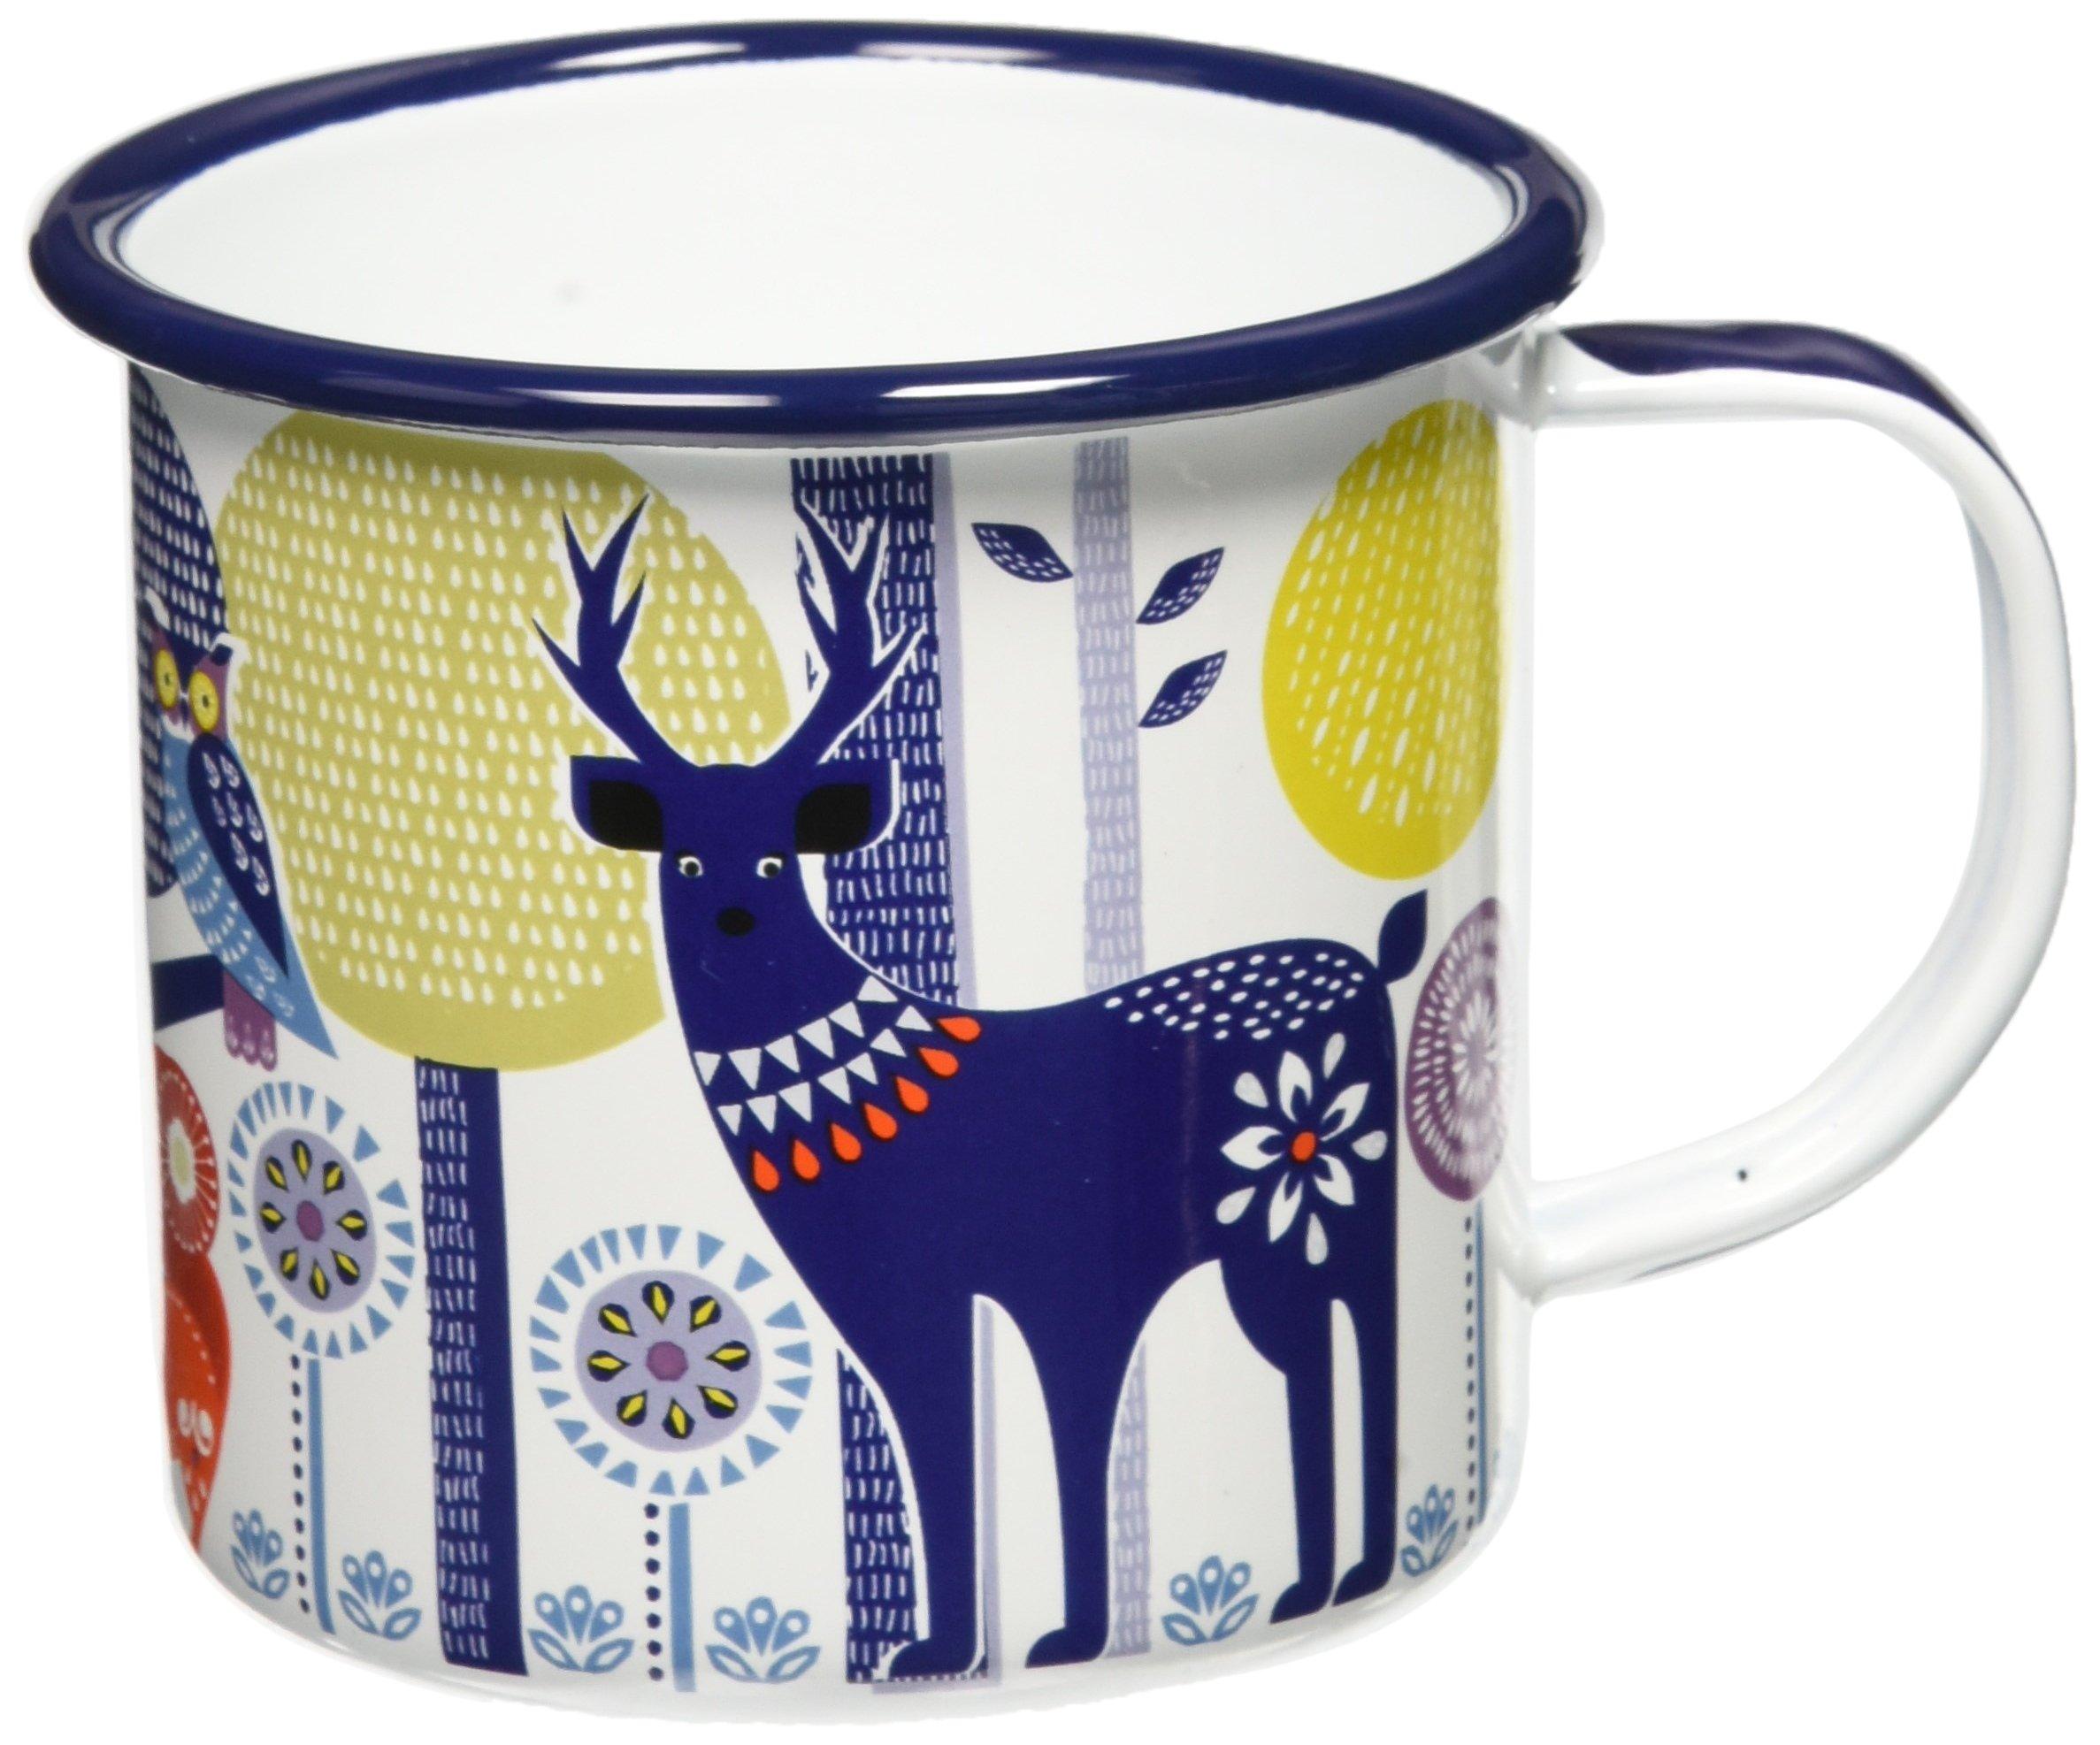 Folklore Enamel Camping Coffee Mug, Day Design, White, (14 Ounces)